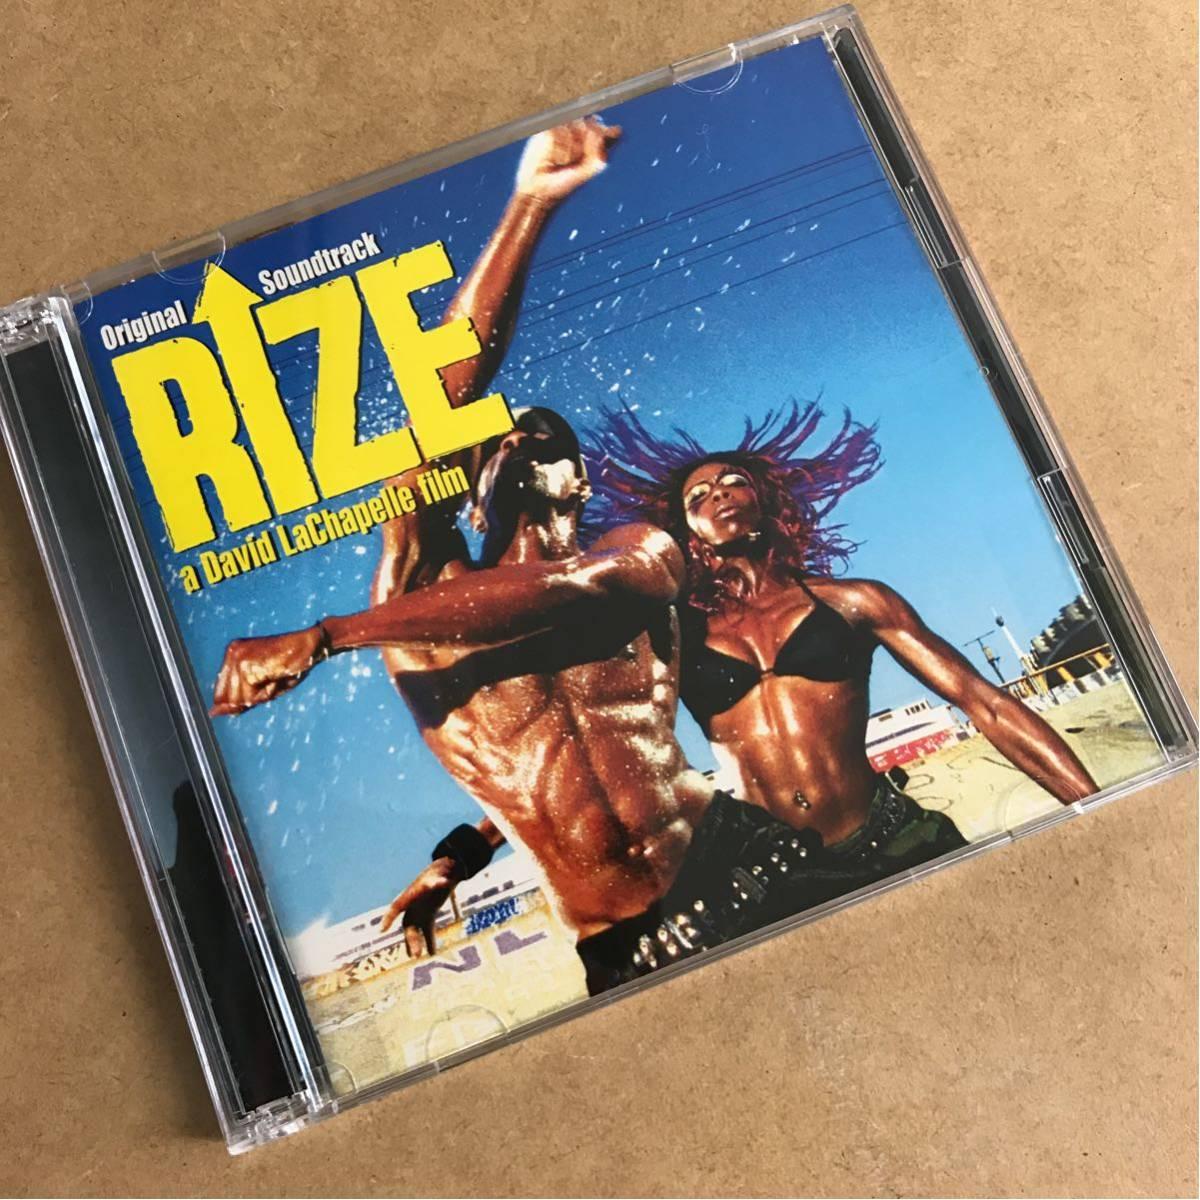 DVD付■RIZE オリジナルサウンドトラック■ニュー・ダンスのドキュメンタリー映画サントラ■Flii Stylz/Dizzee Rascal/Christina Aguilera_画像1